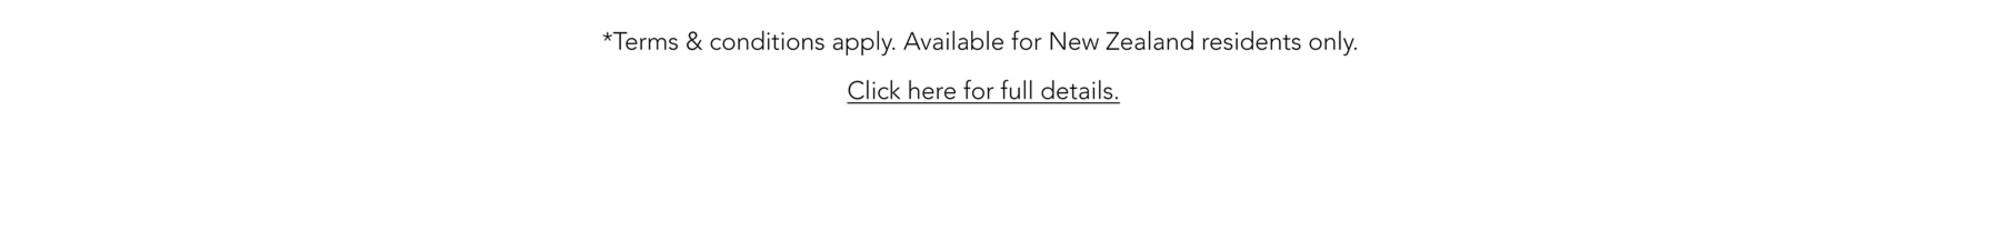 AfterPay NZ